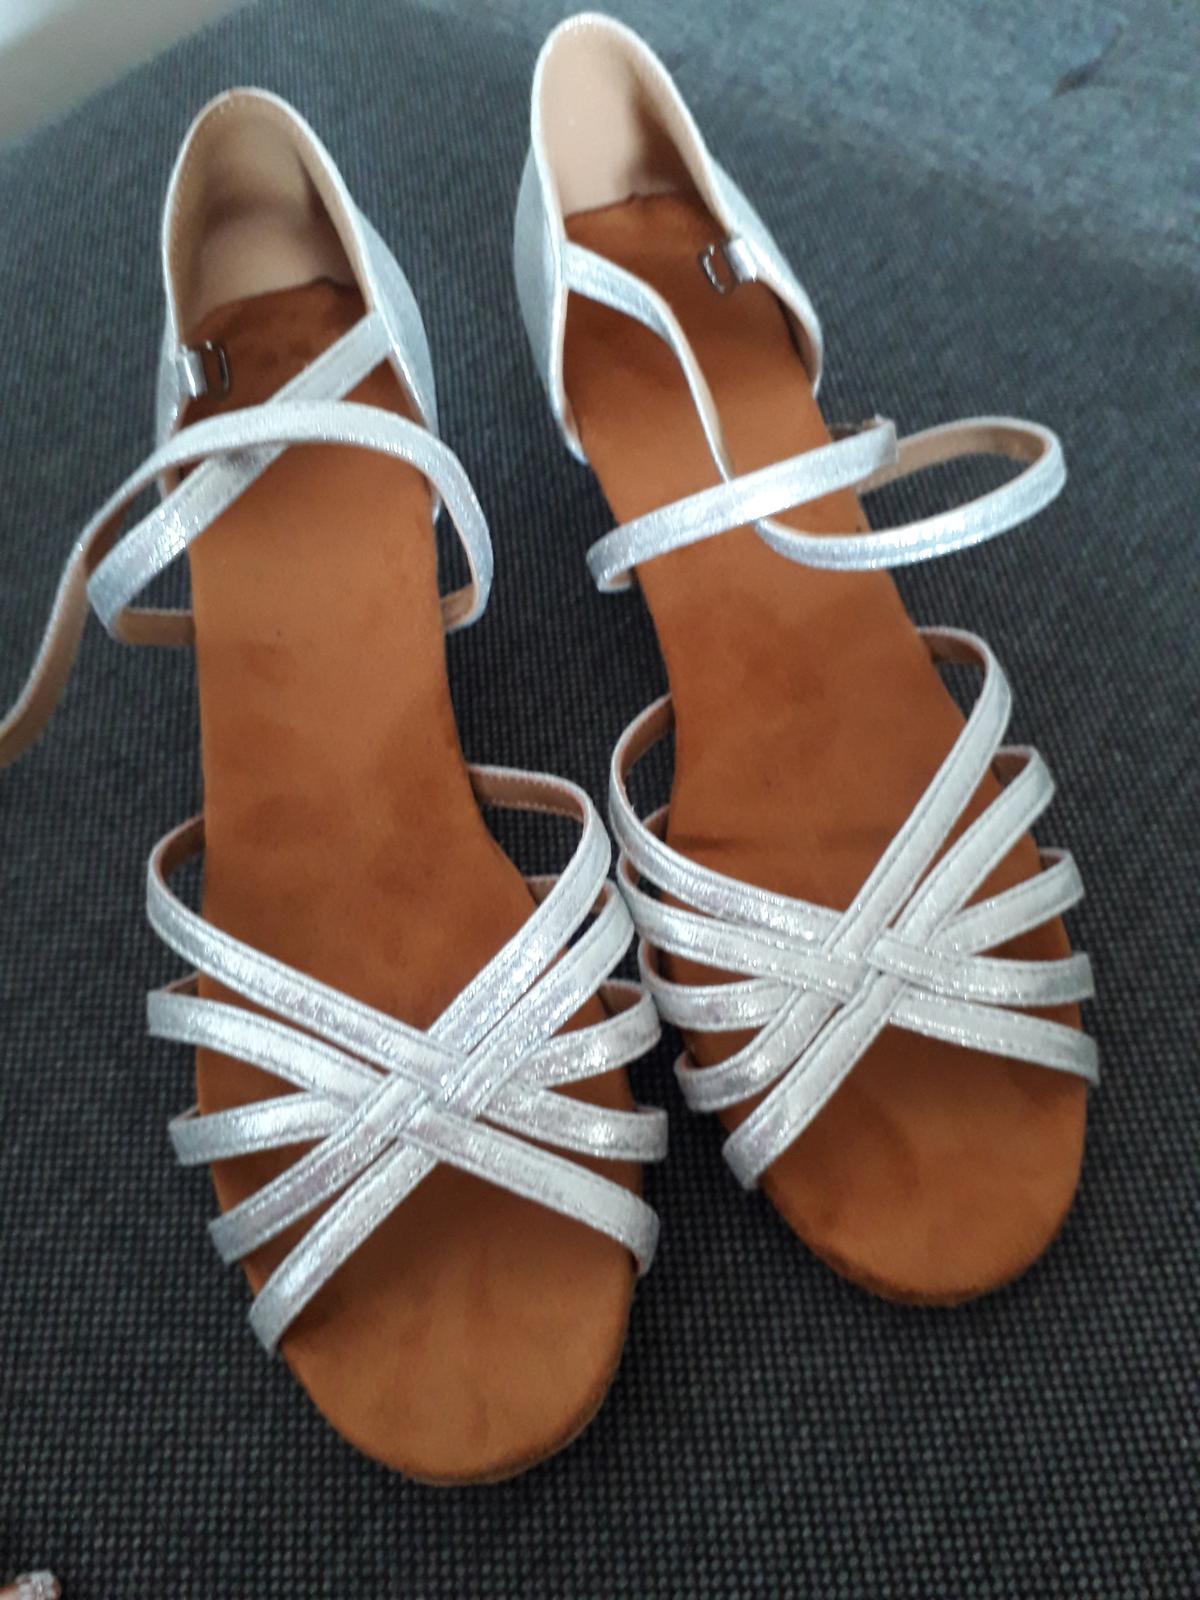 Sandále nízky opätok - Obrázok č. 4